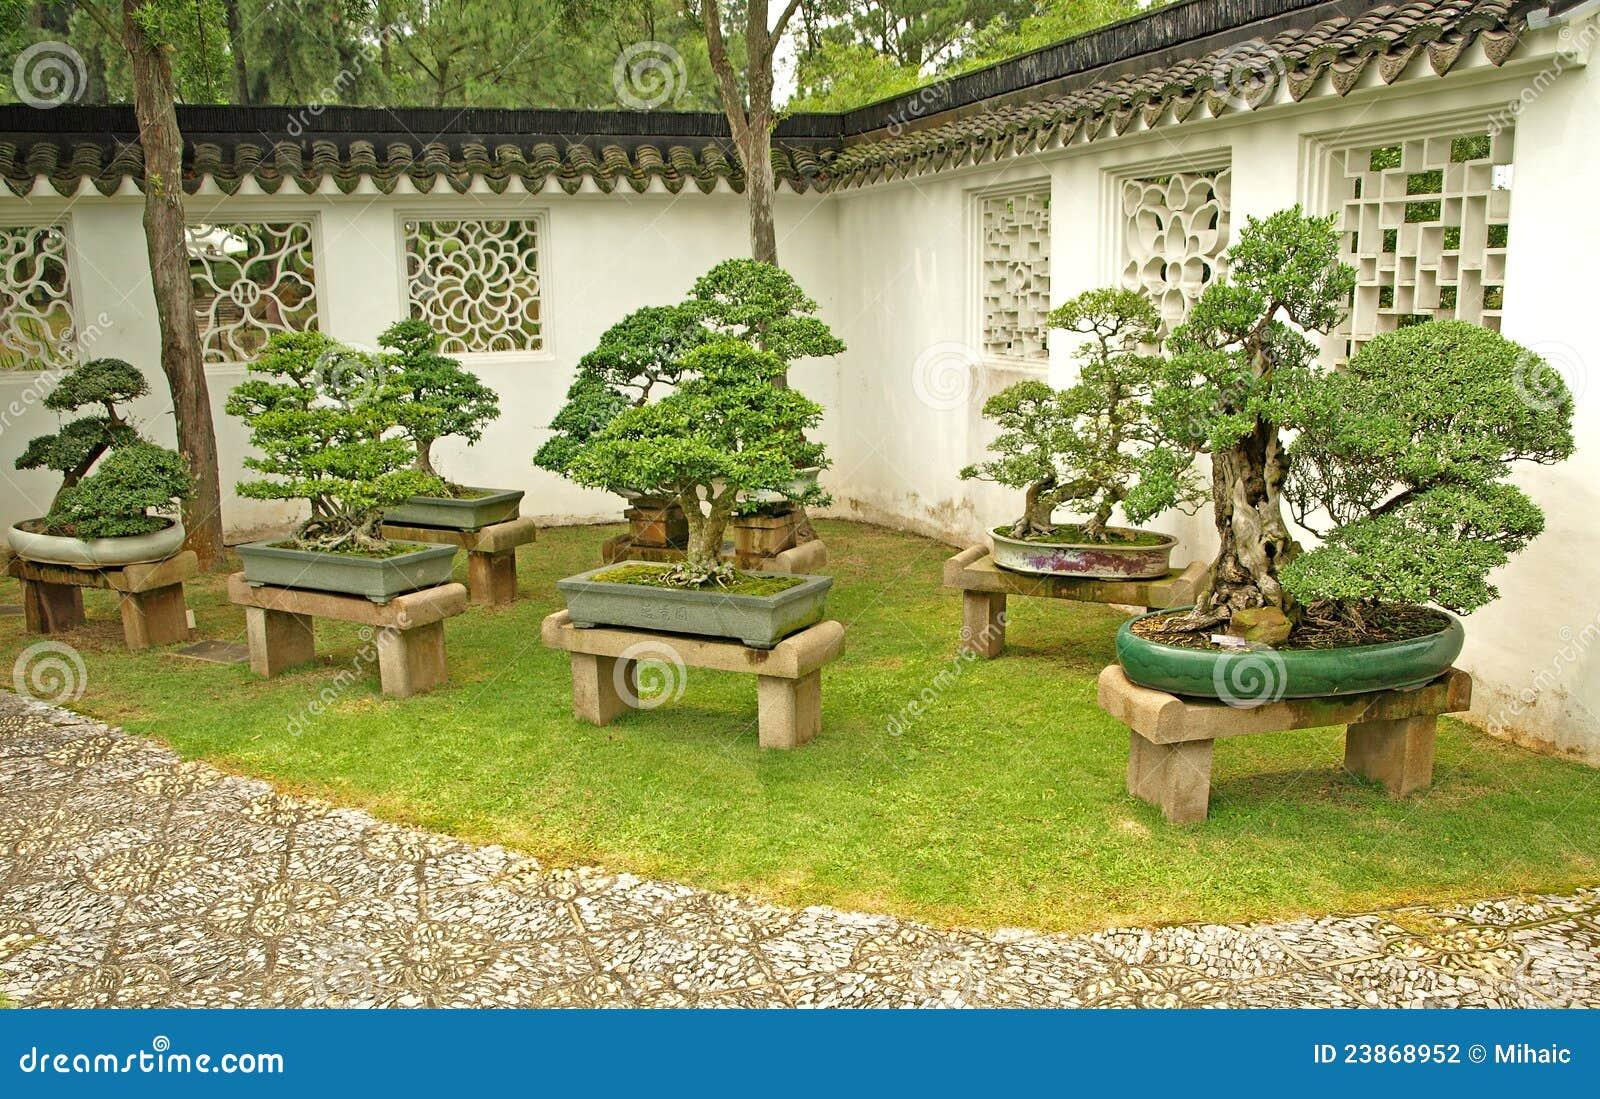 Bonsai On Display Stock Photo Image Of Buddha Nature